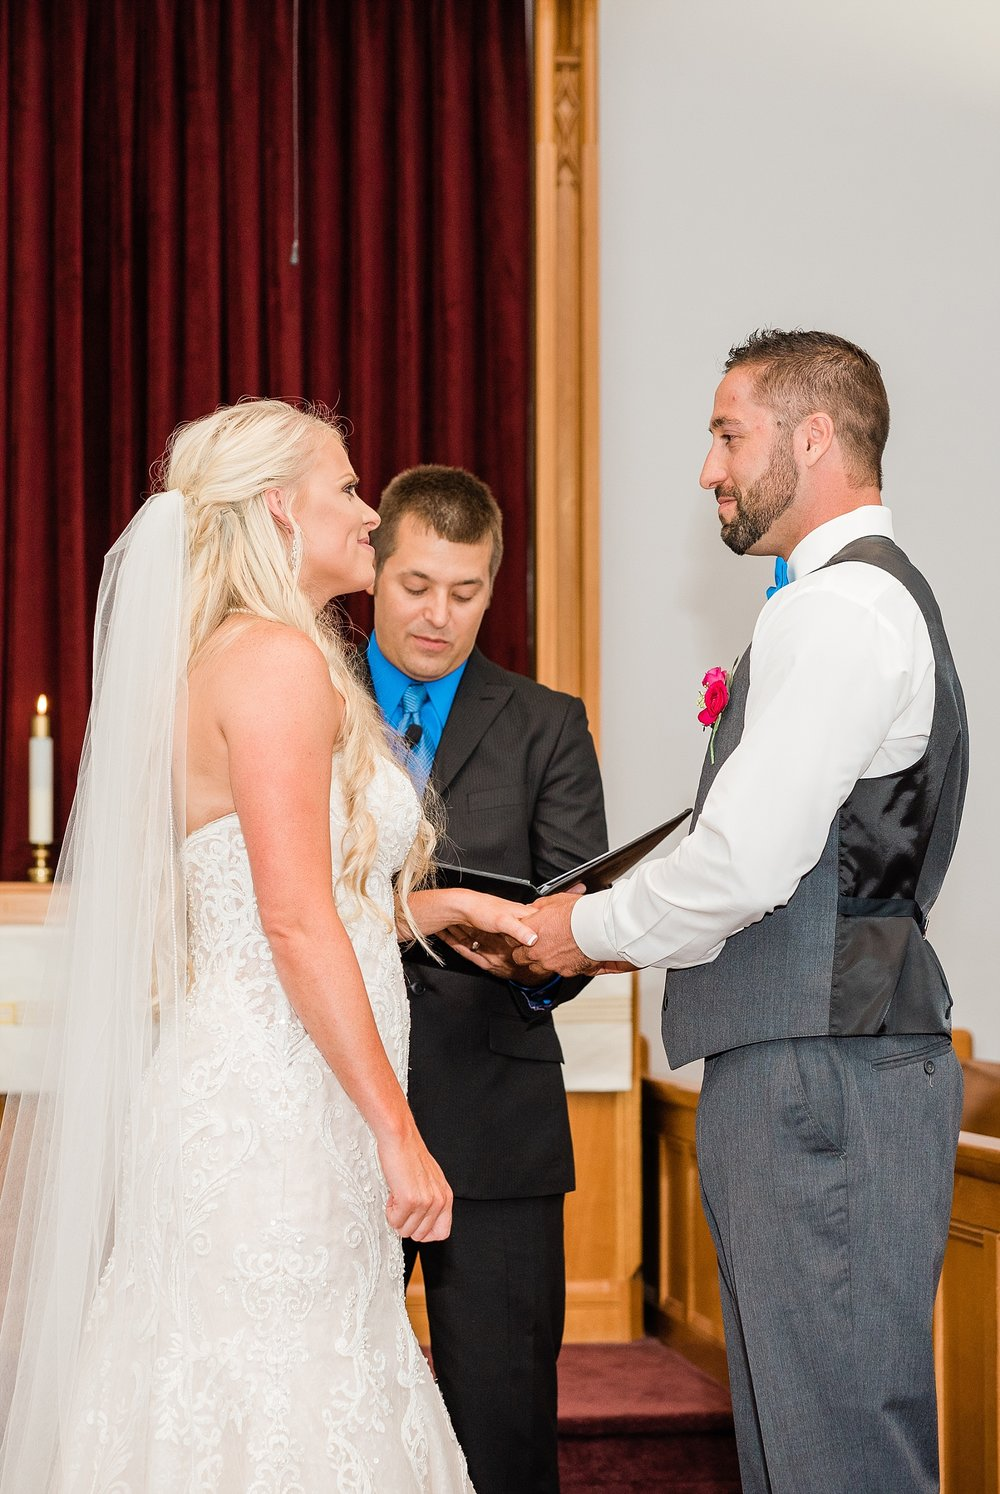 Alan and Heather Horn Wedding by Kelsi Kliethermes Photography Associate - Rachel_0045.jpg